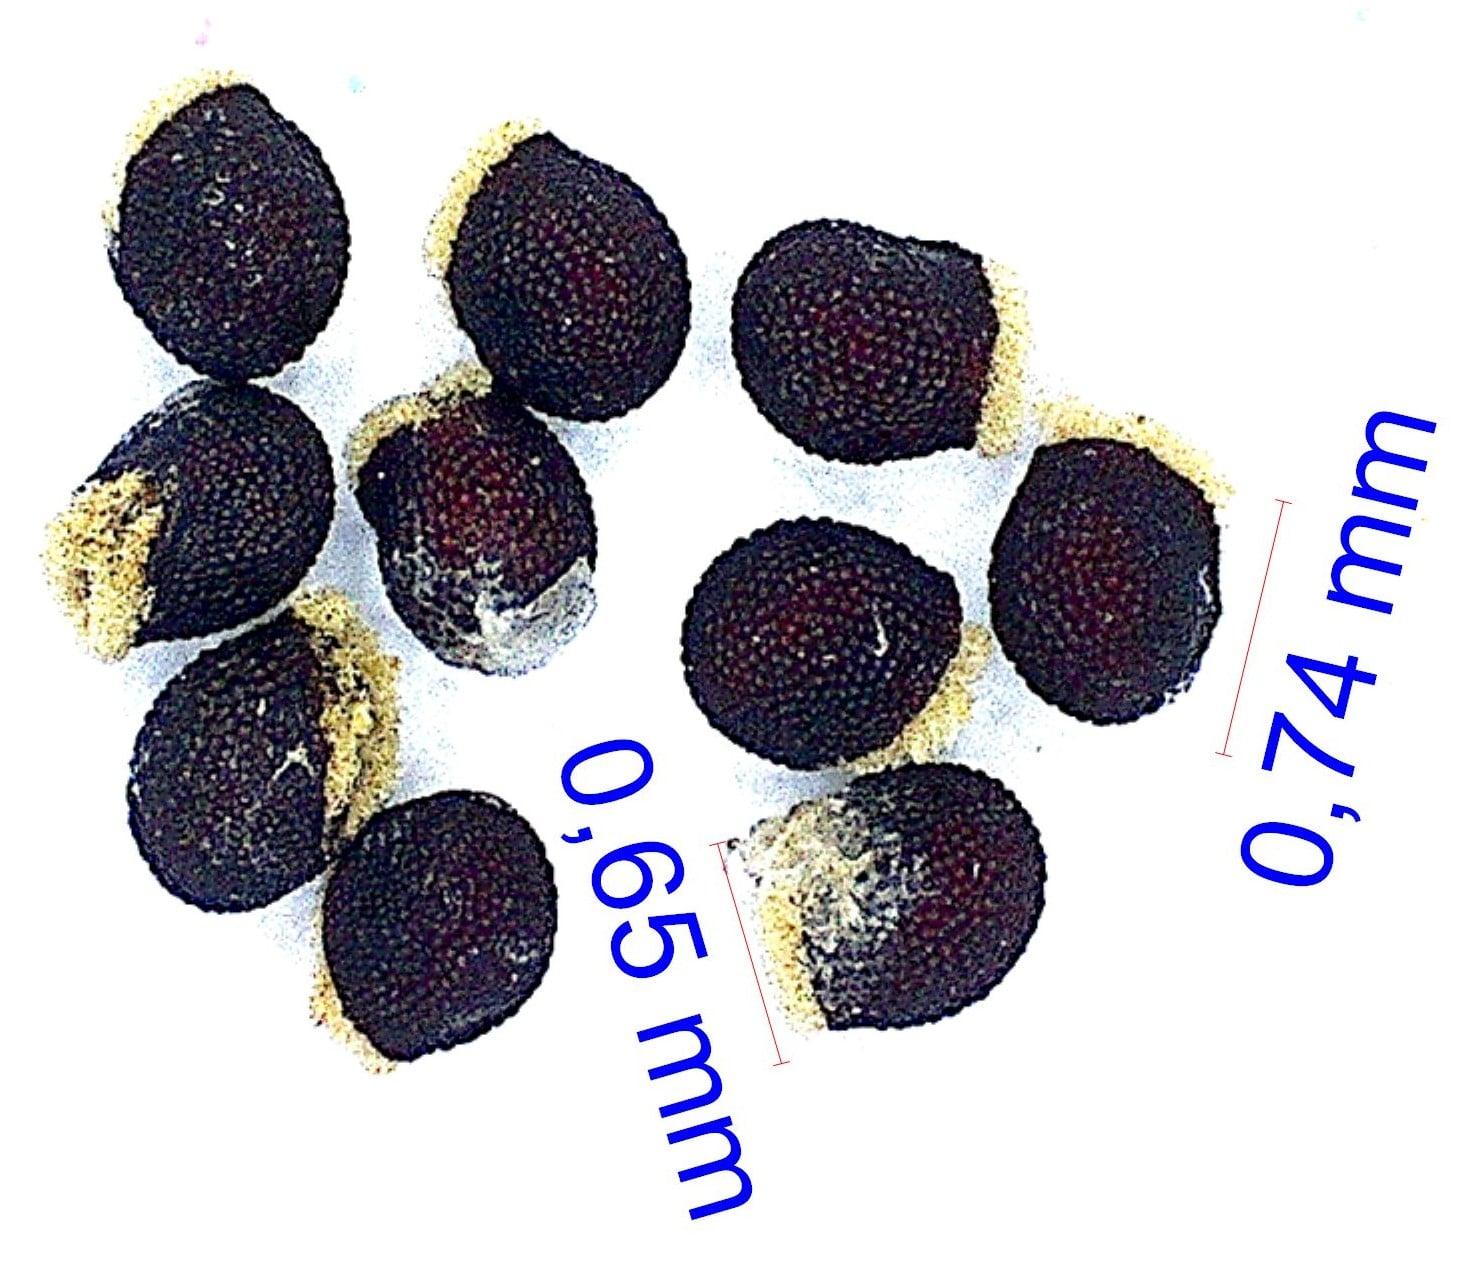 Gymnocalycium rhodantherum (guanchinense P 226) © Joël Lodé/cactus-aventures.com